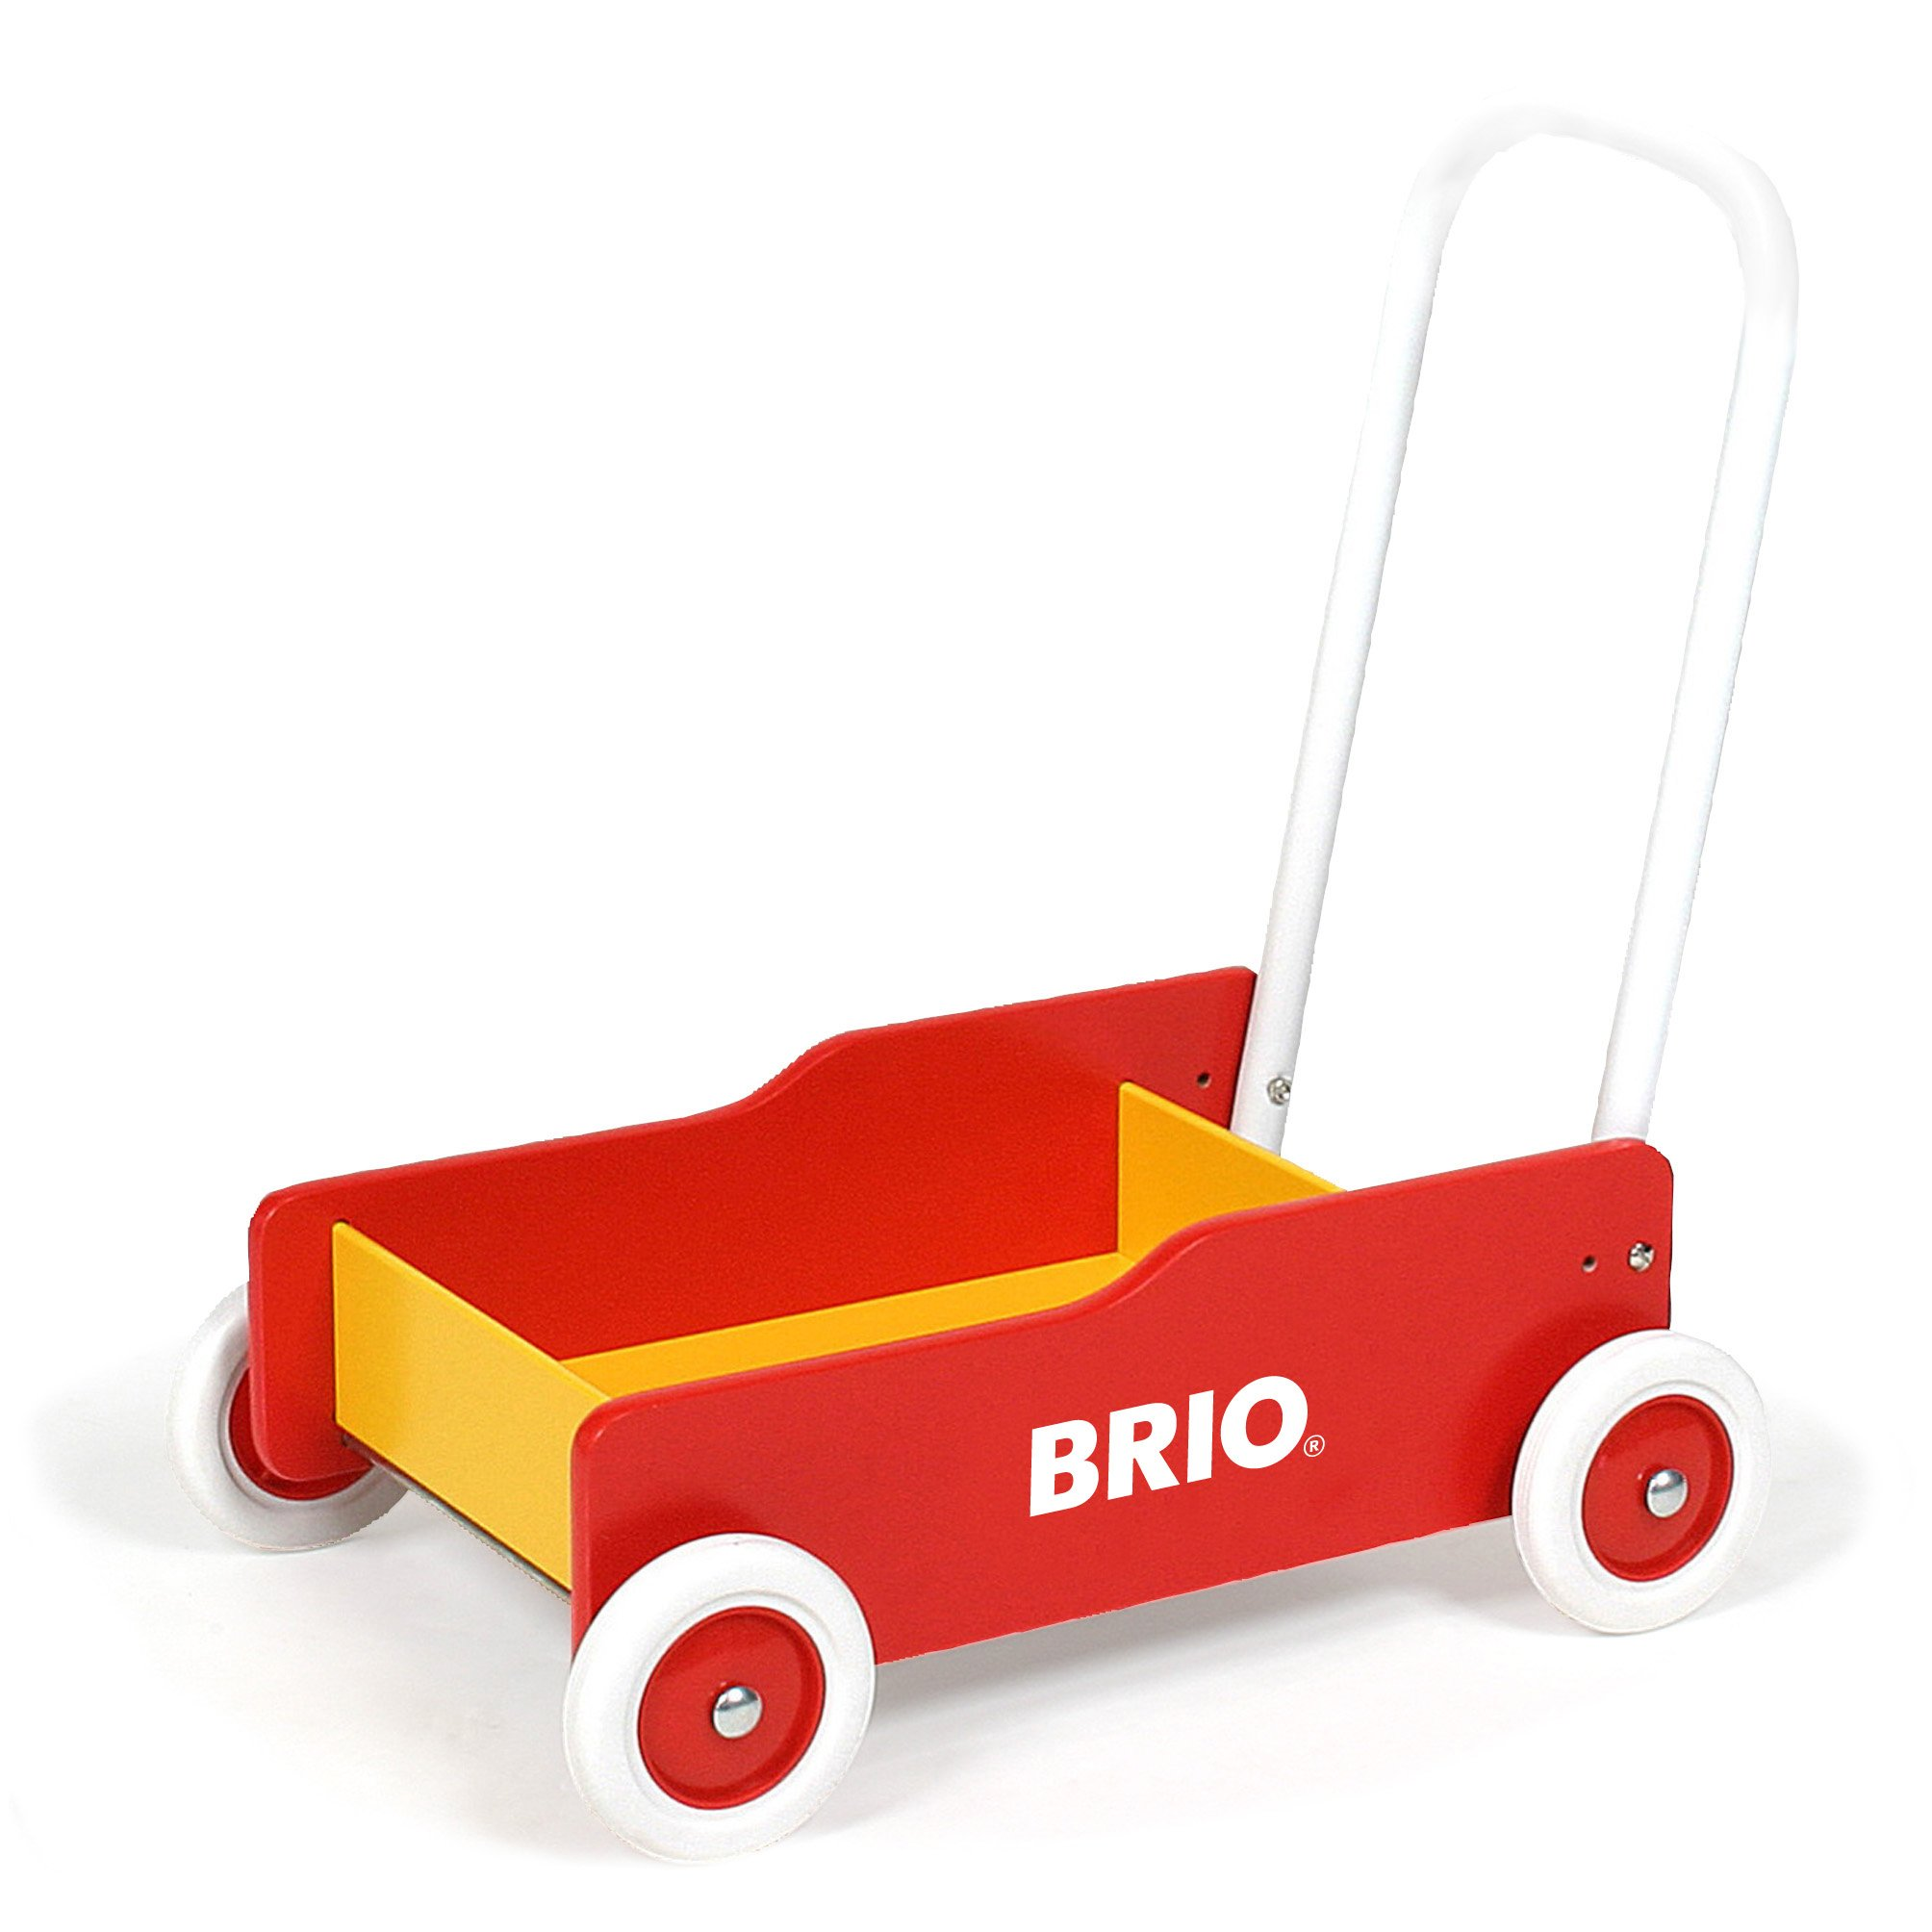 BRIO - Toddler Wobbler, red (31350)